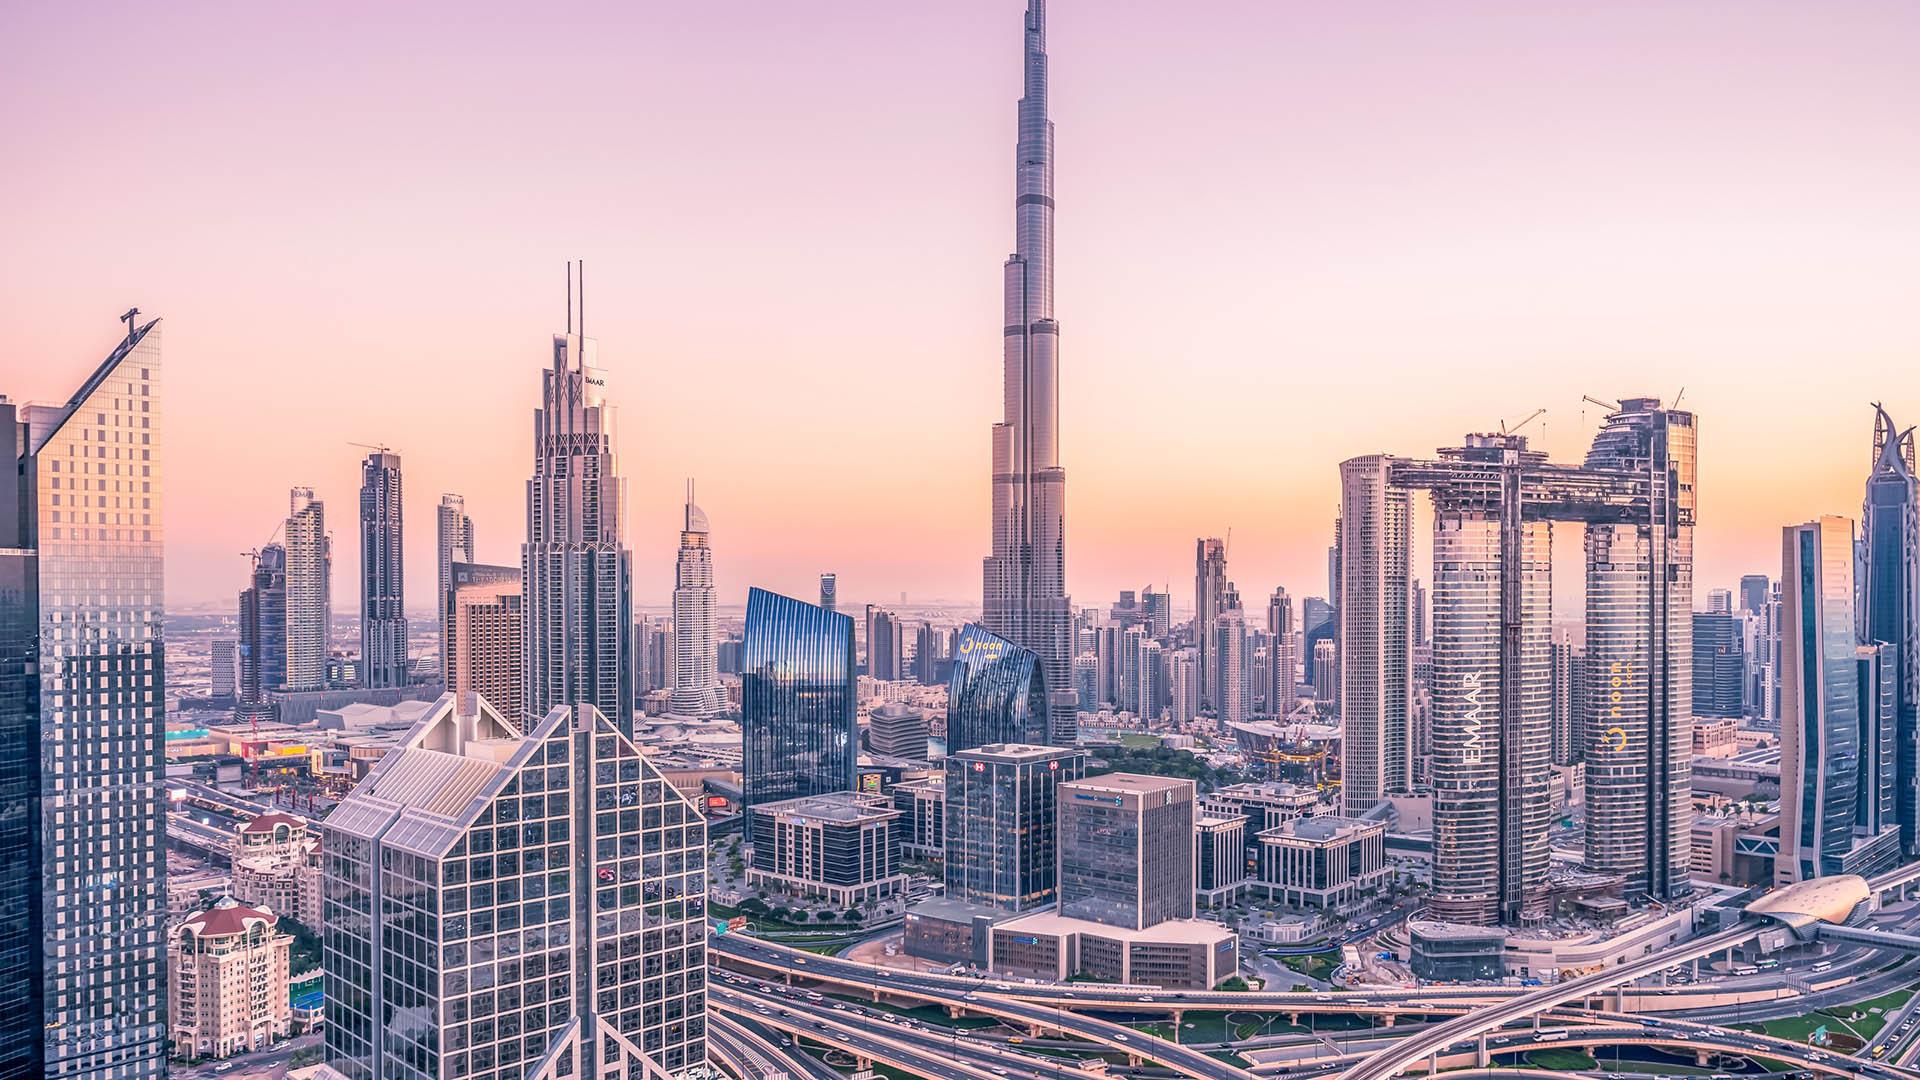 Downtown Dubai - 4